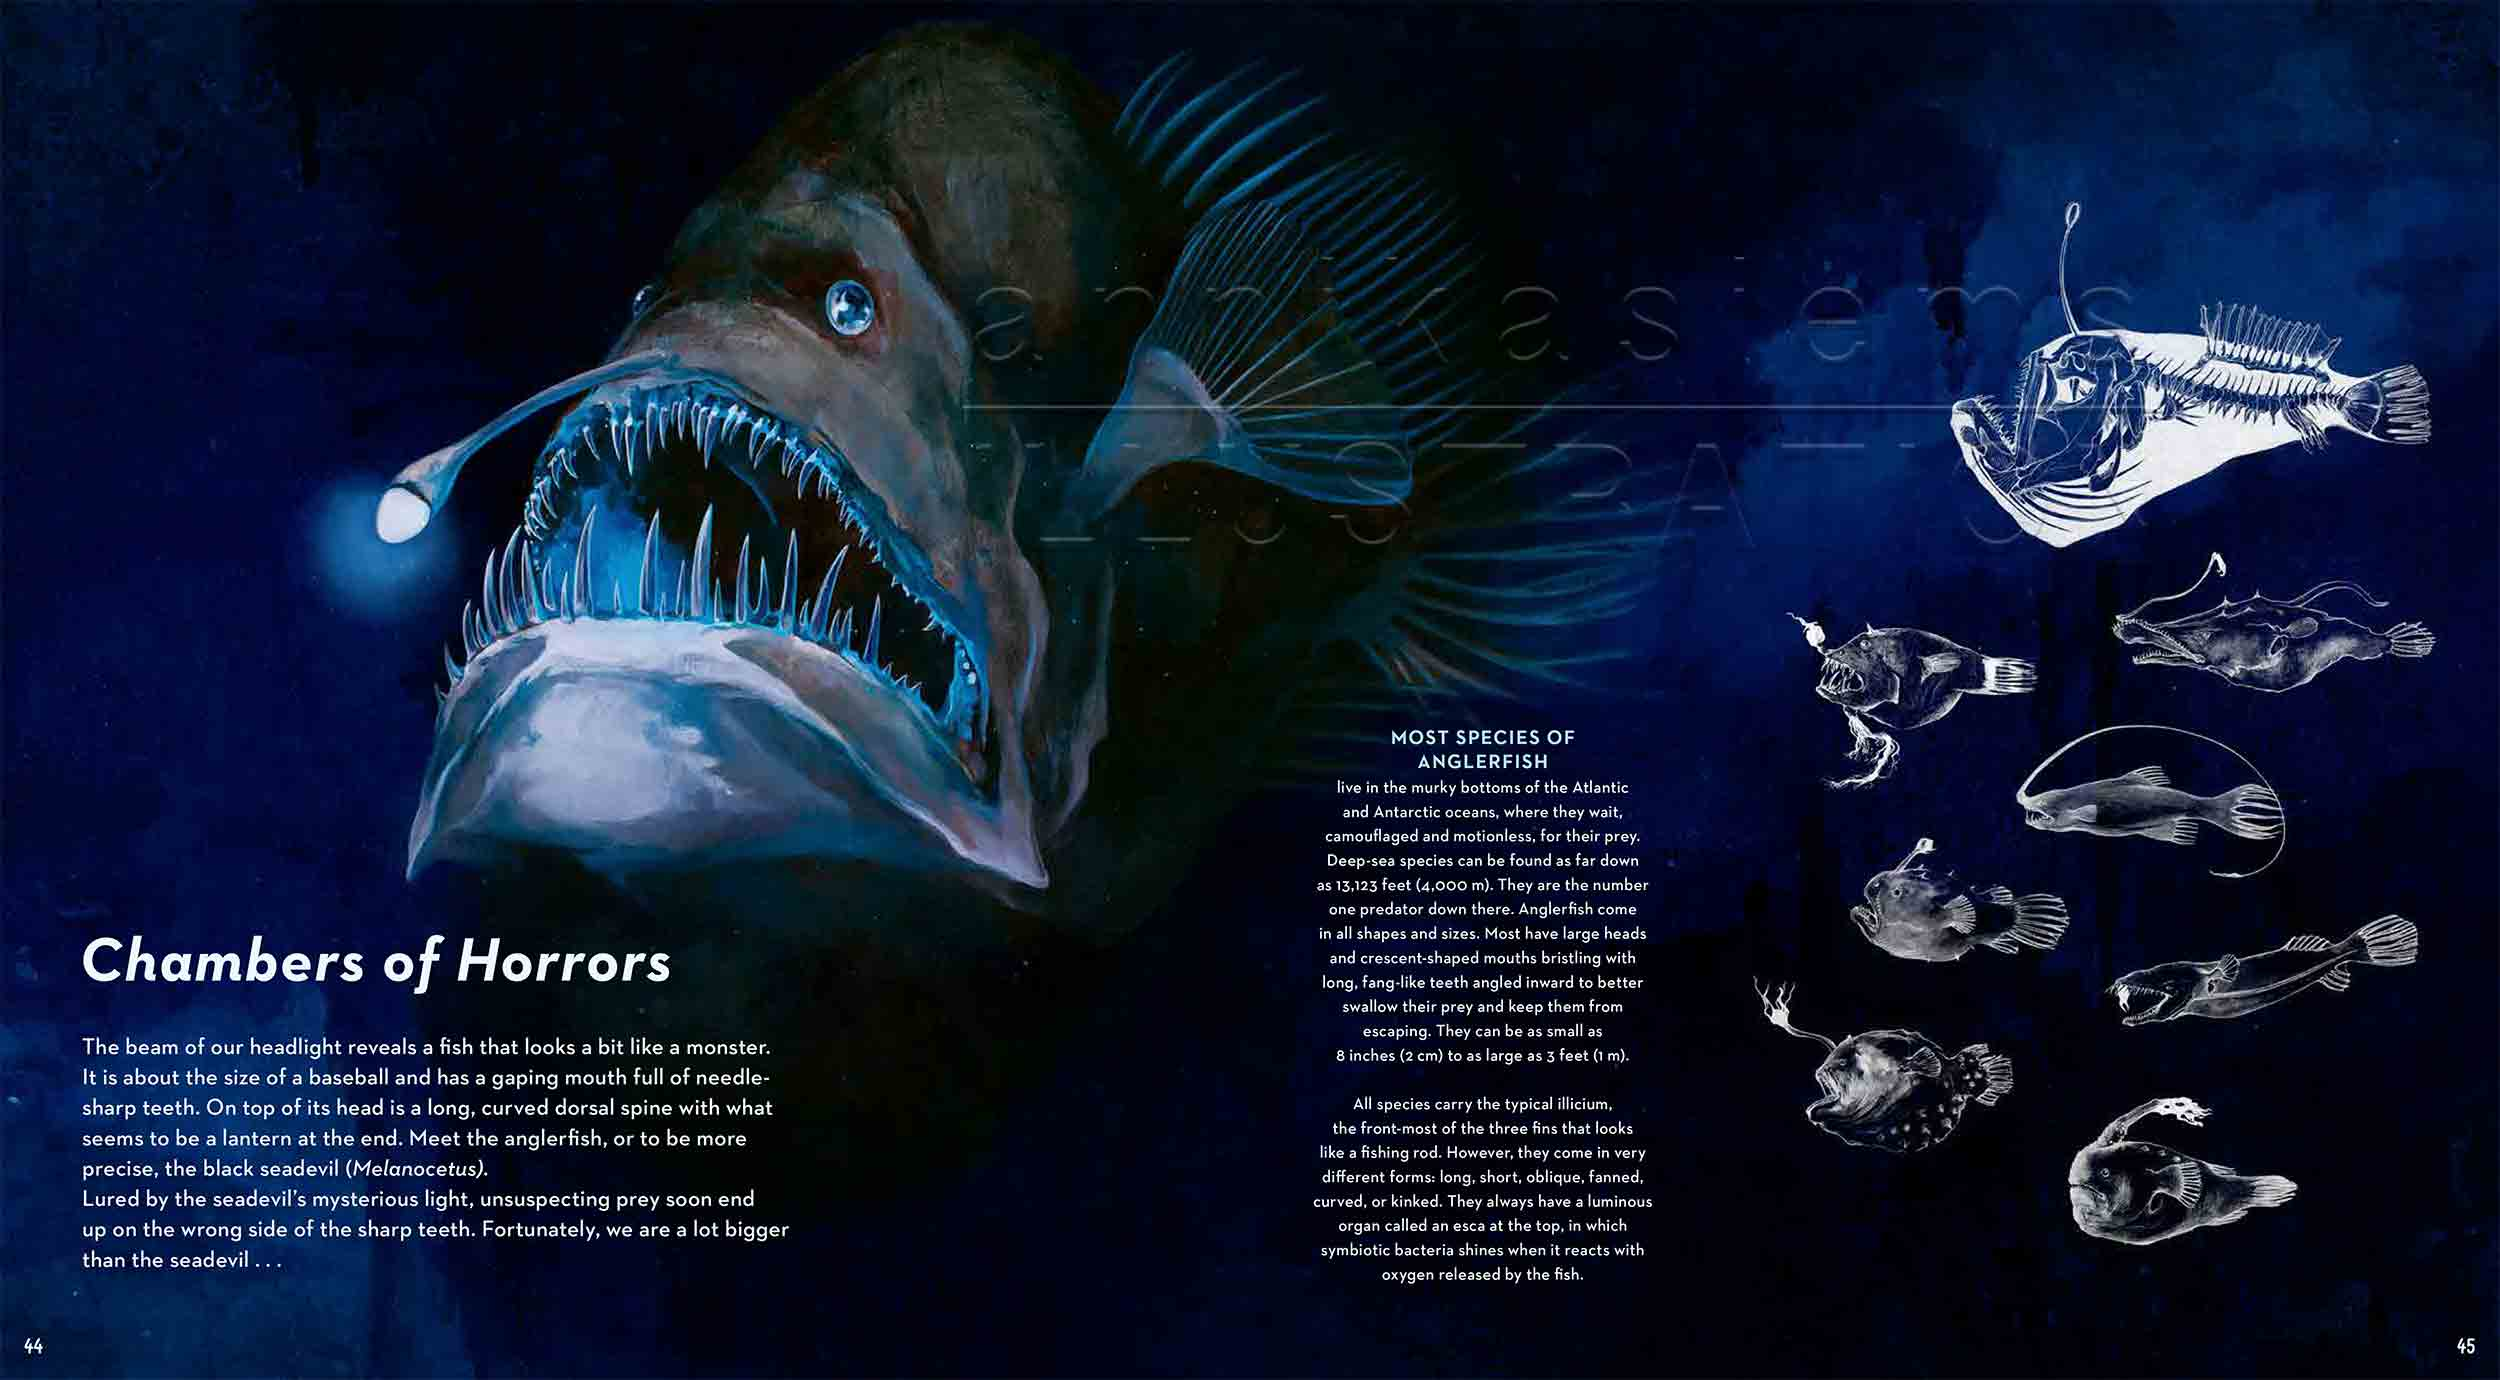 44-45-anglerfisch-lanternfish-Leuchtkalmar-fireflysquidfish-fish-deep-sea-Englisch-submersible-©annikasiems-plankton_deepsea-zooplankton.jpg